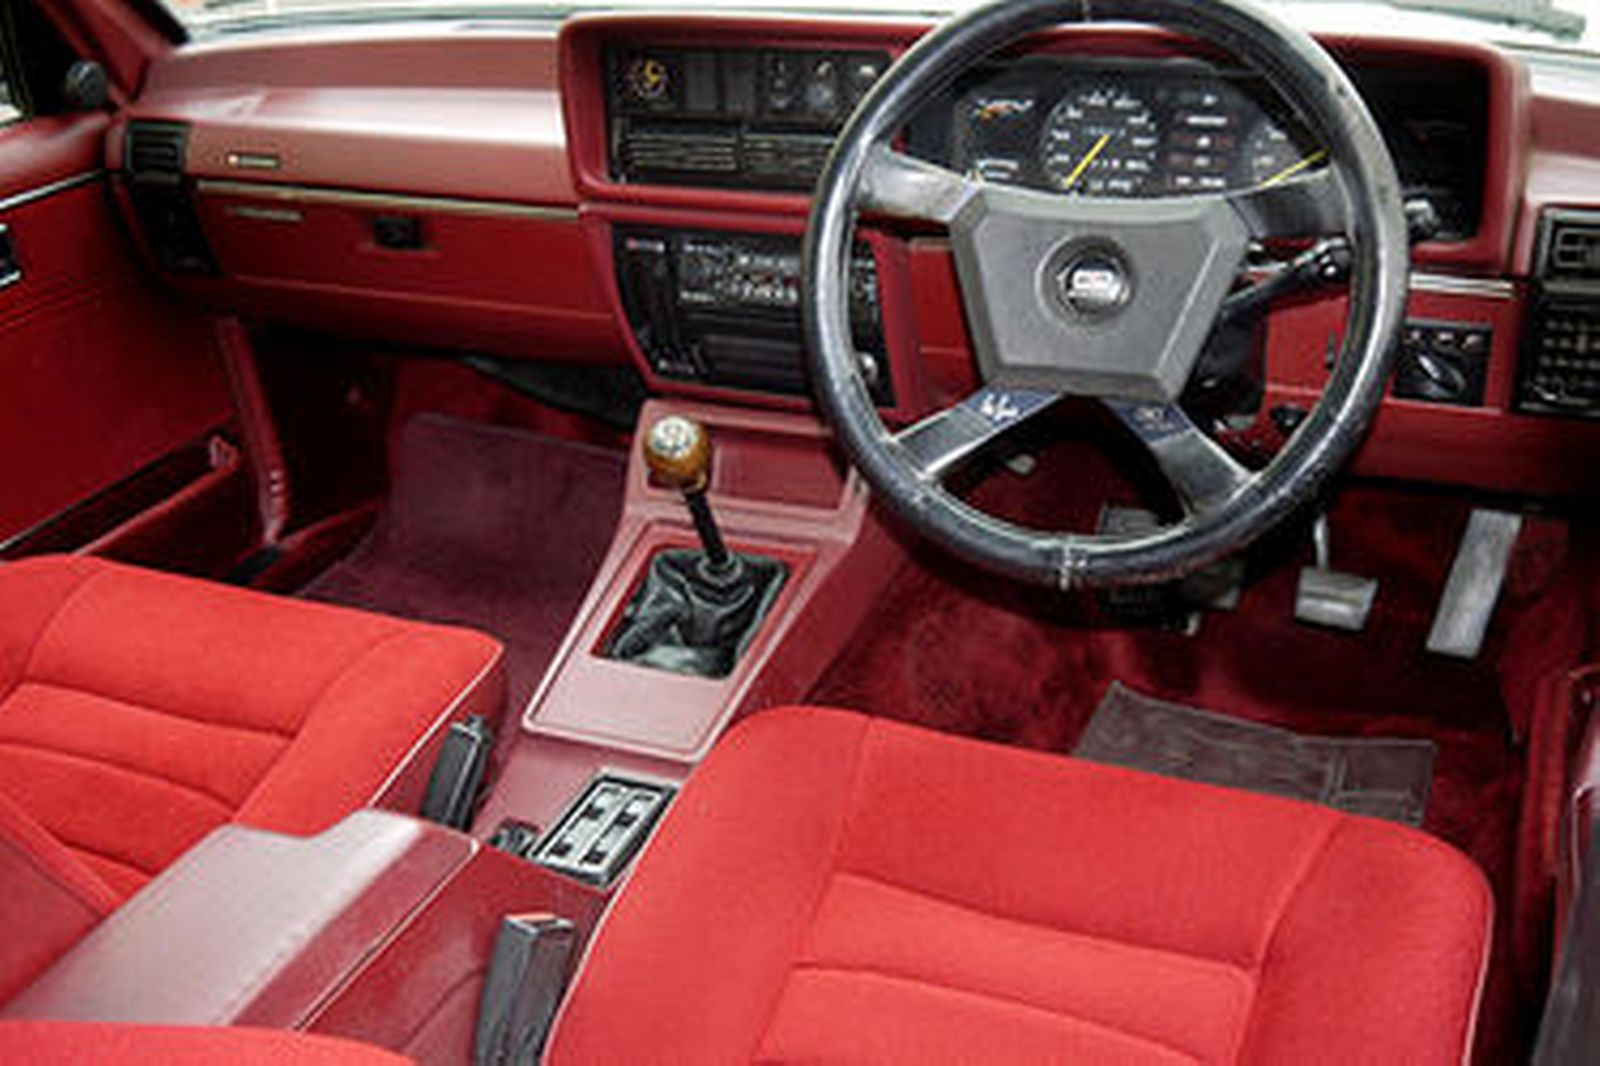 Holden Commodore Vc Brock Hdt Sedan Auctions Lot 35